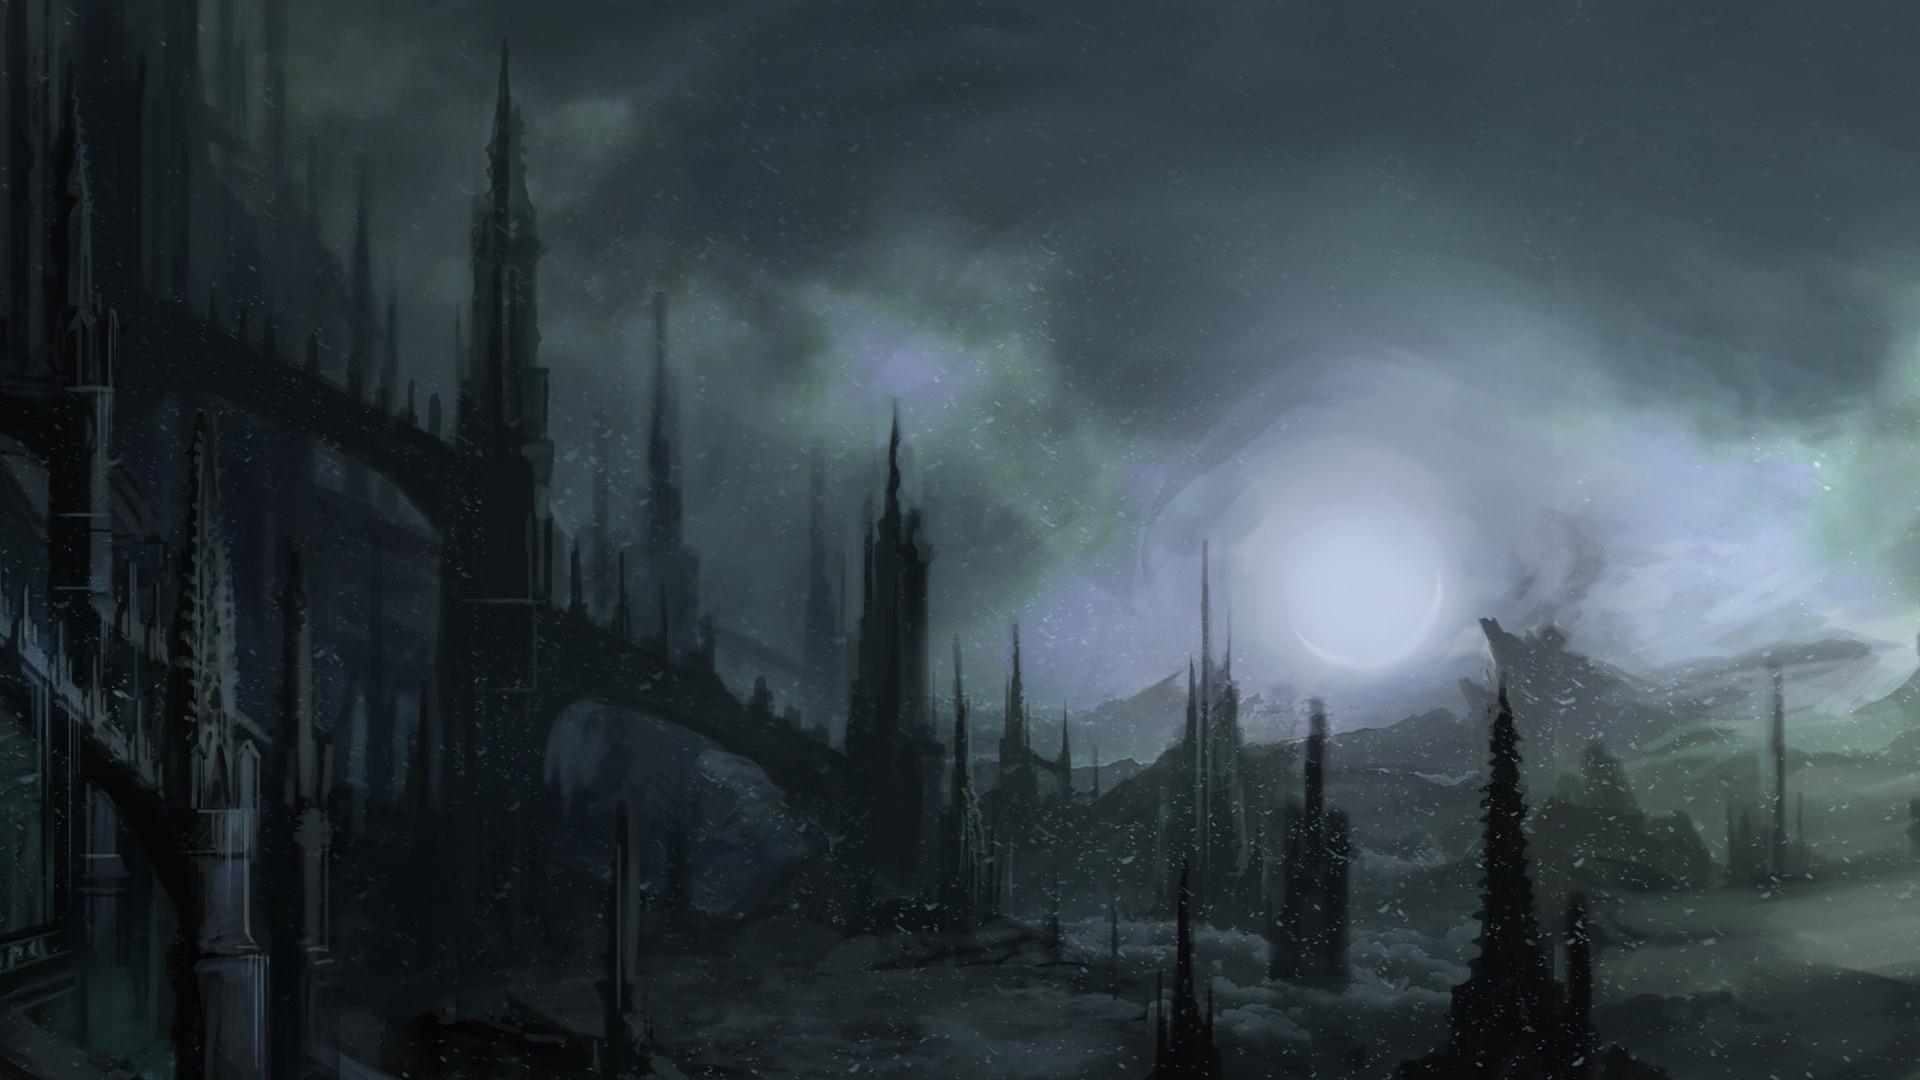 Gloomy Background